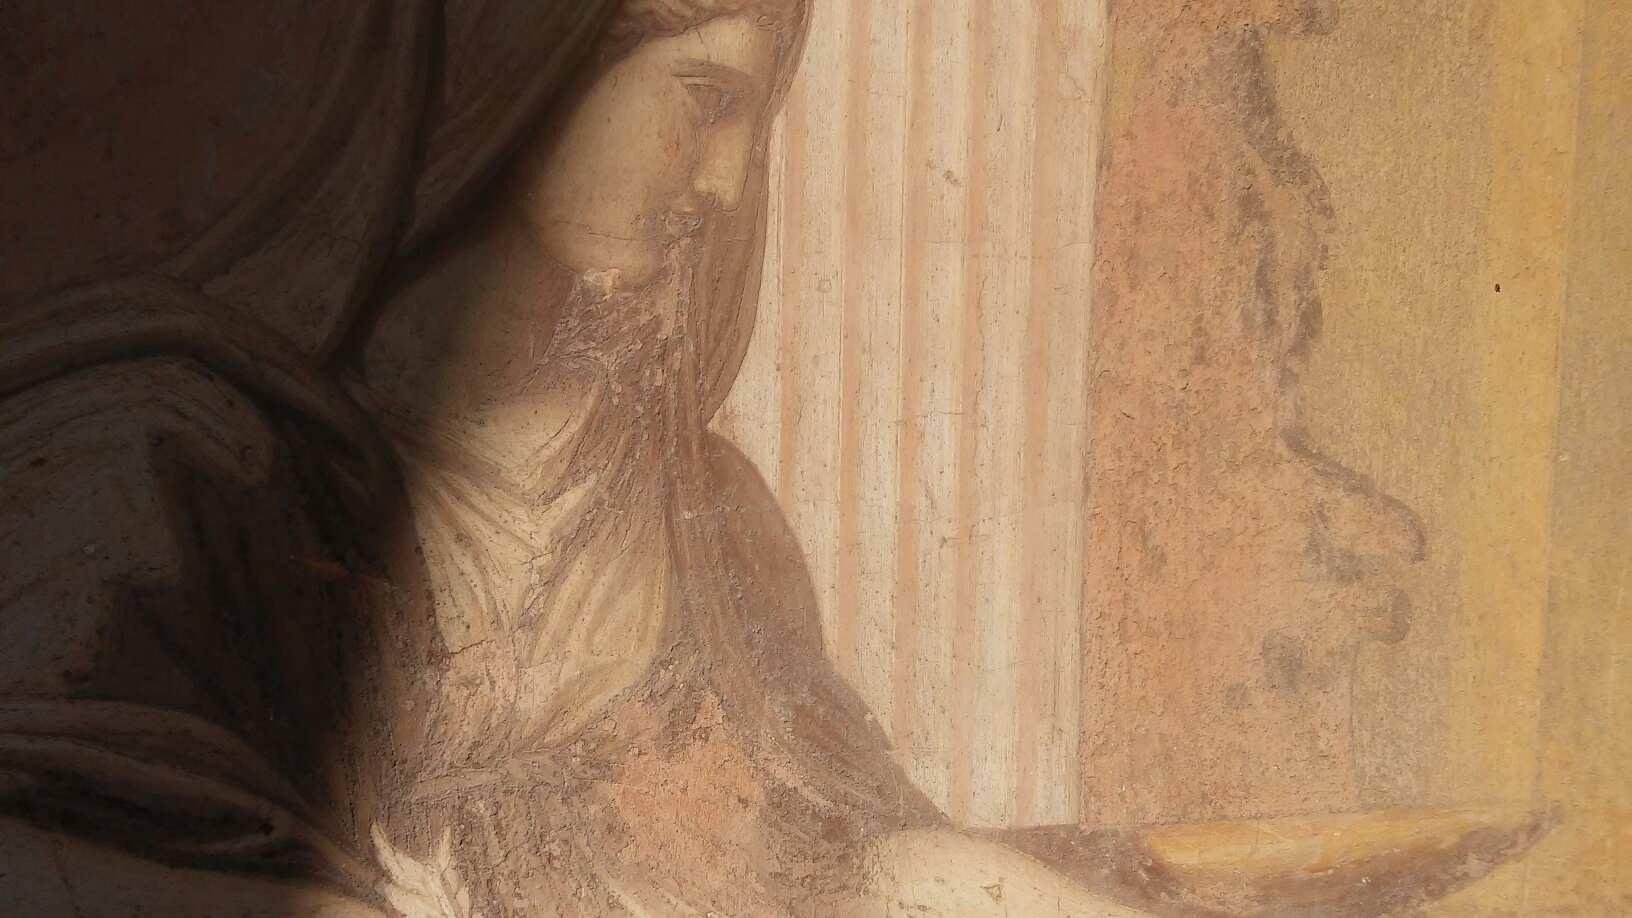 Matrimonio In Roma Antica : Nell antica roma dicembre iunonis iugalis festa di giunone